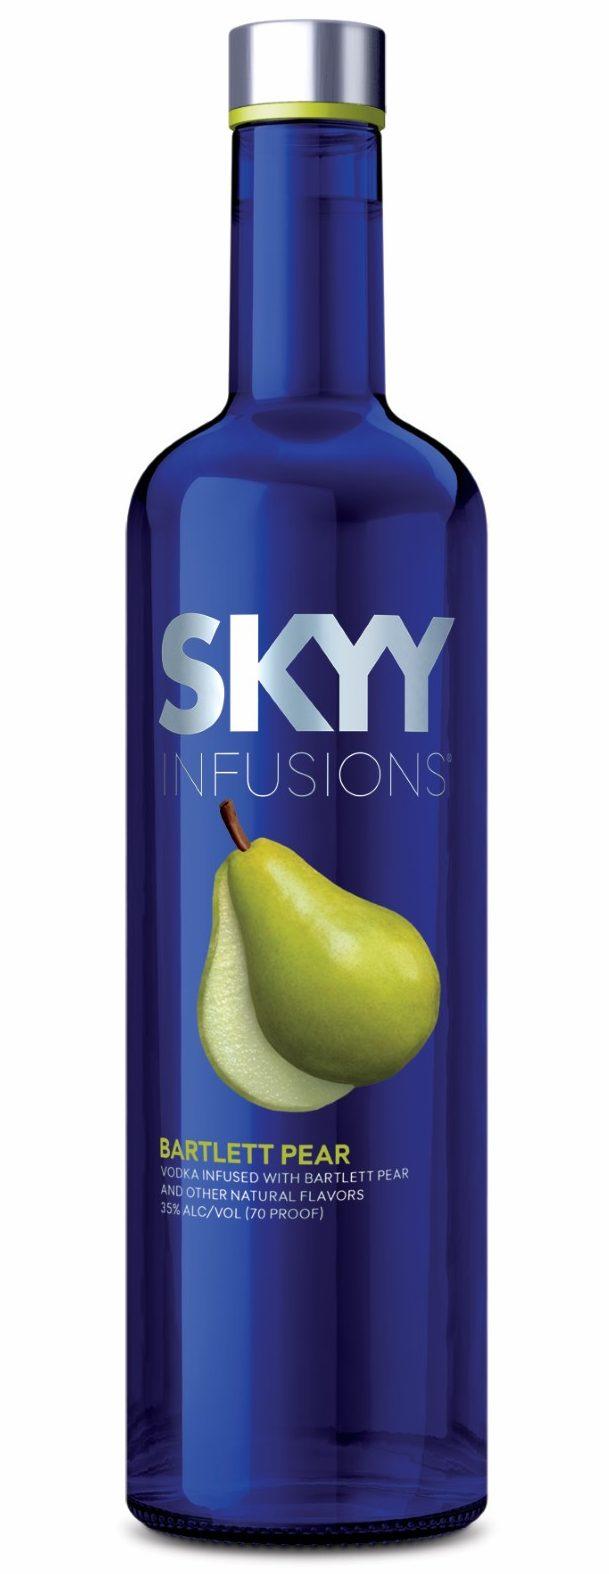 Skyy Infusions Bartlett Pear Vodka